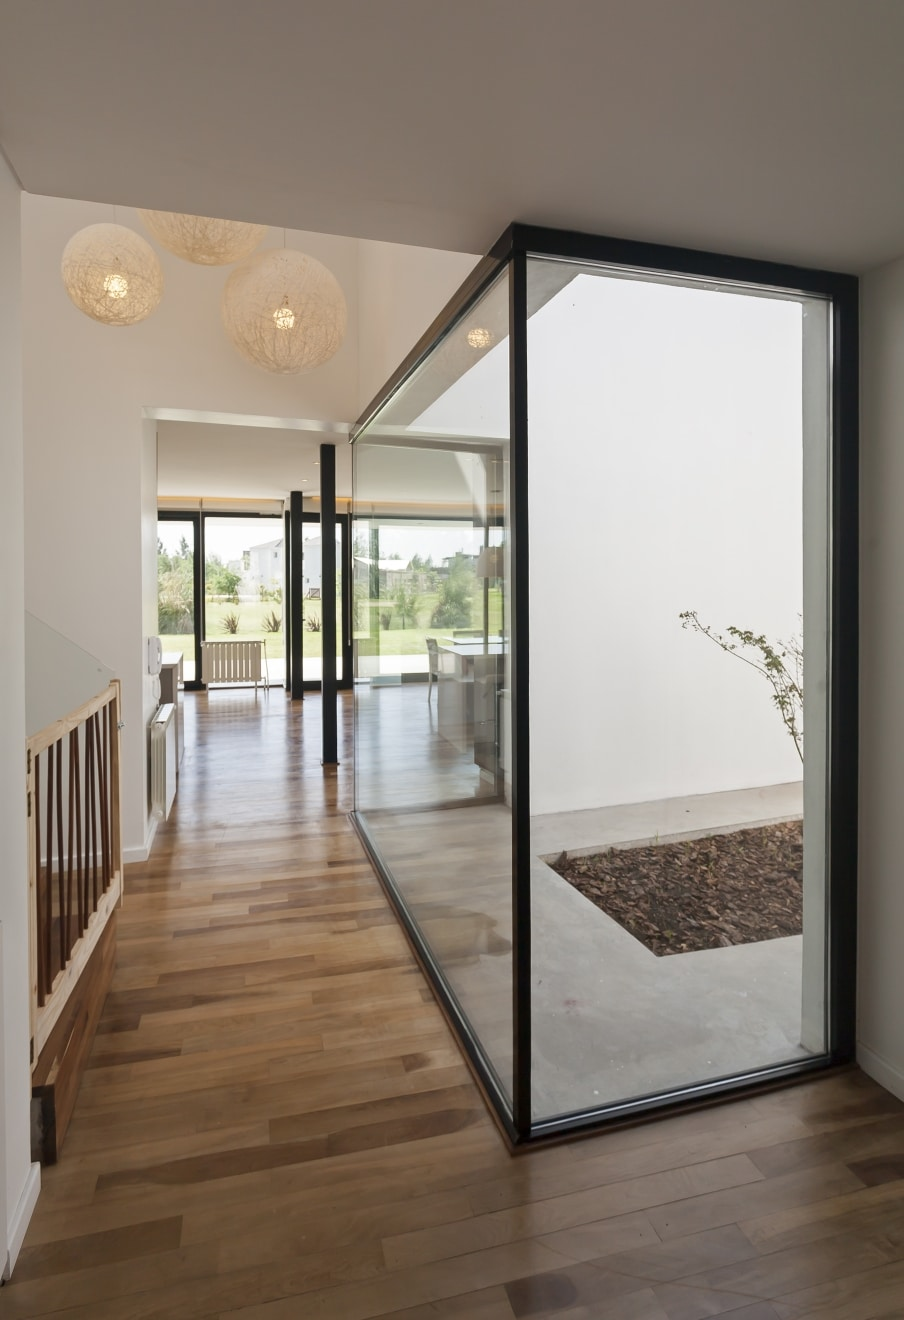 Planos de casa de dos pisos moderna construye hogar for Planos de interiores de casas